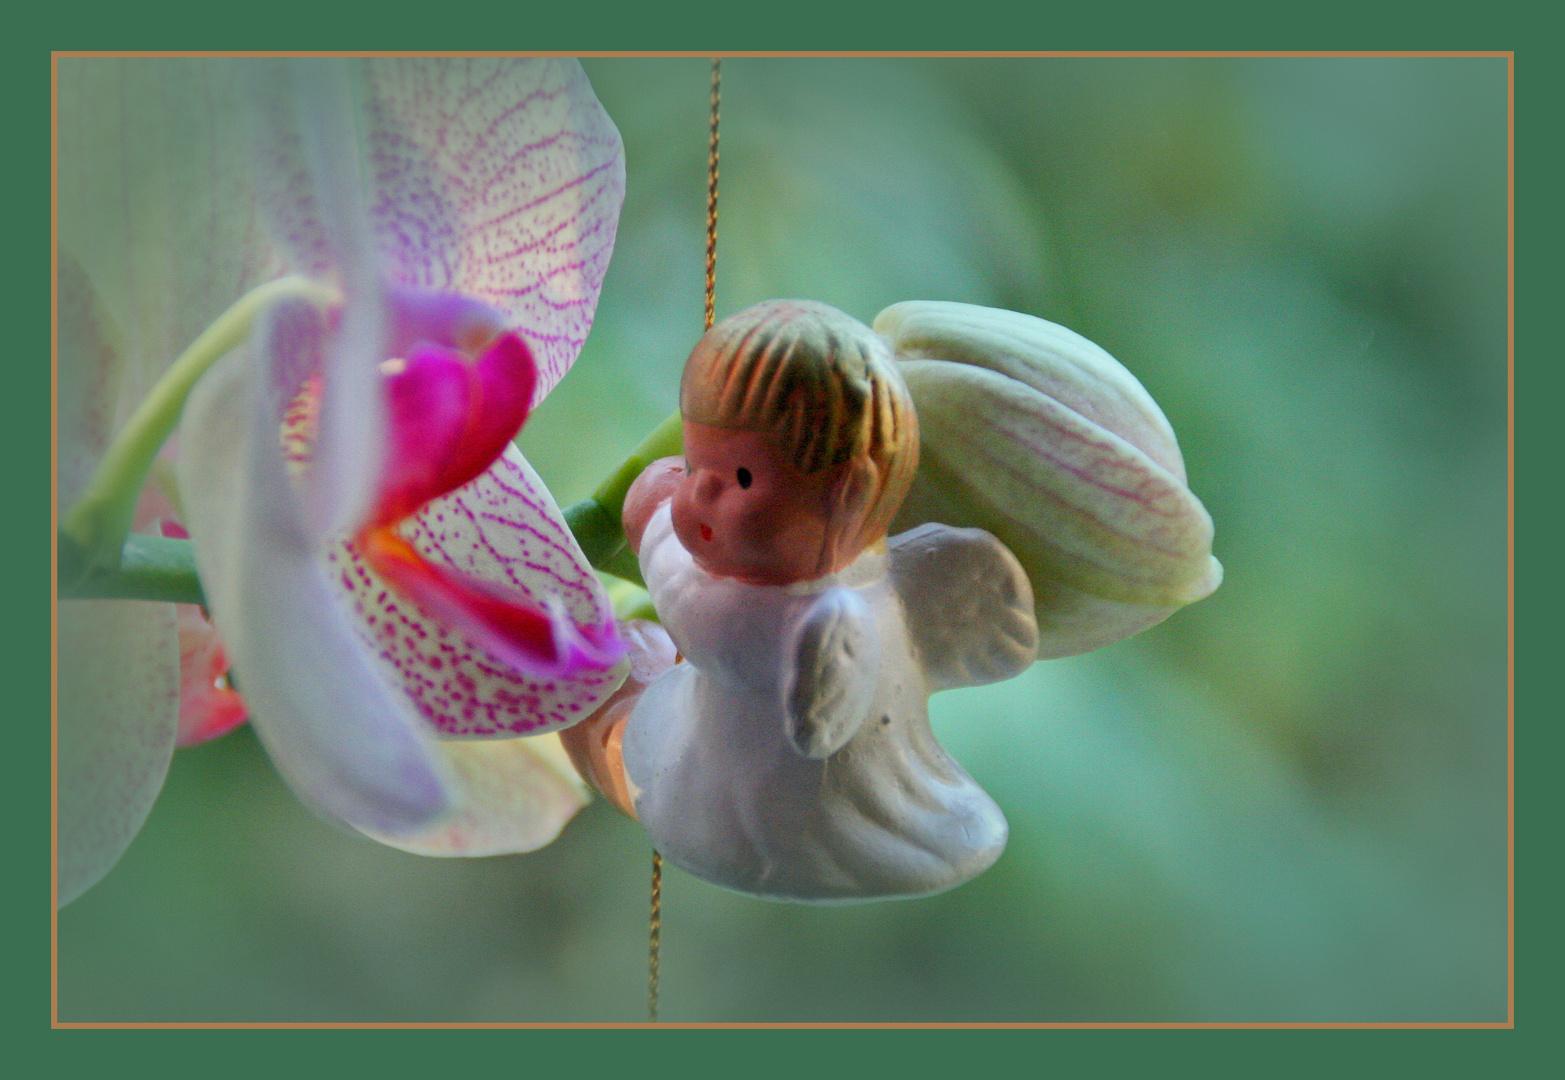 Engel trifft Orchidee...